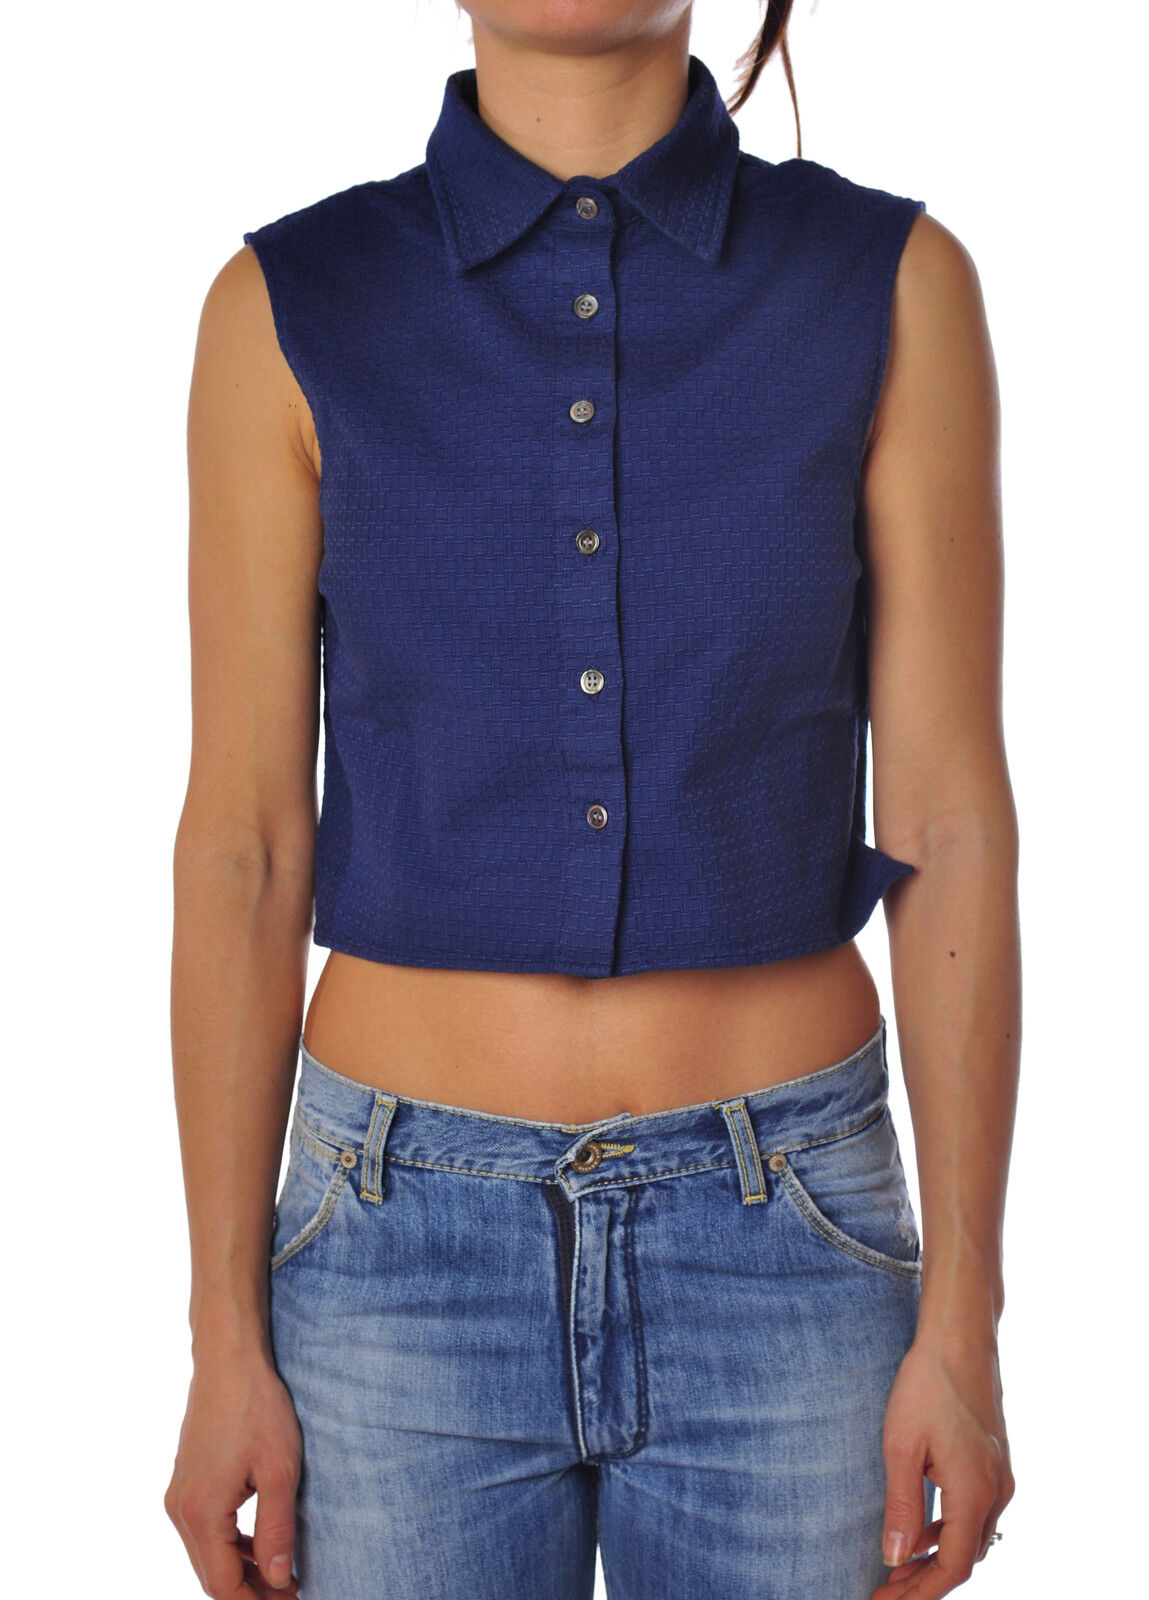 Department 5 - Shirts-Blouses - Woman - Blau - 1522507E191544